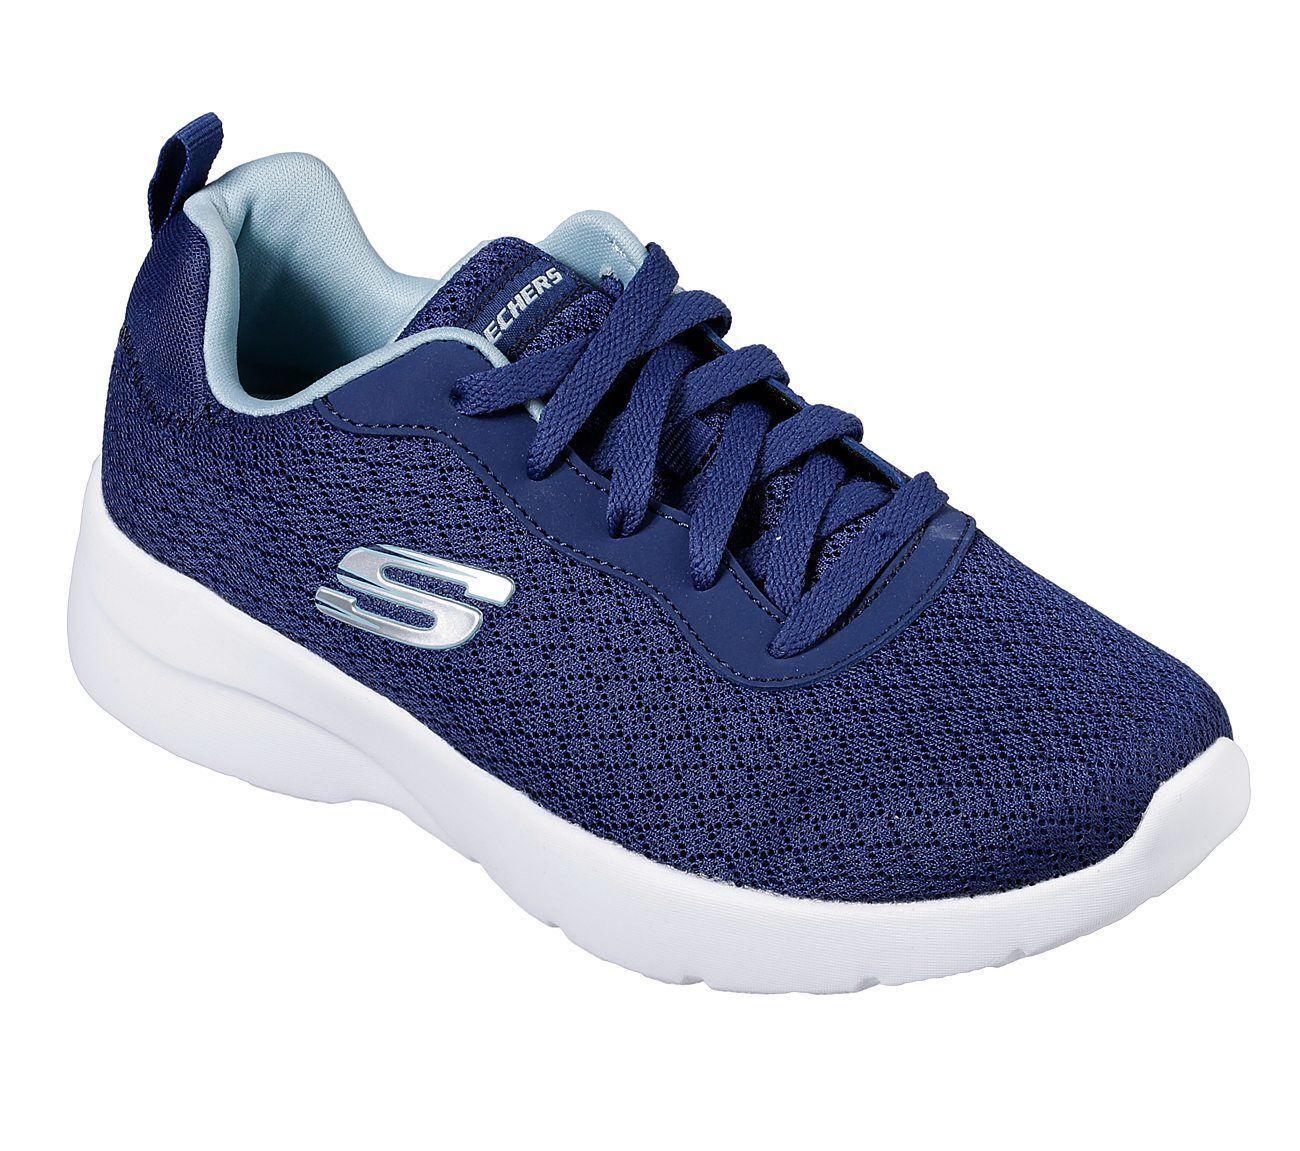 Navy Skechers shoes Mesh Womens Memory Foam 12964 Sport Train Casual Woven Light